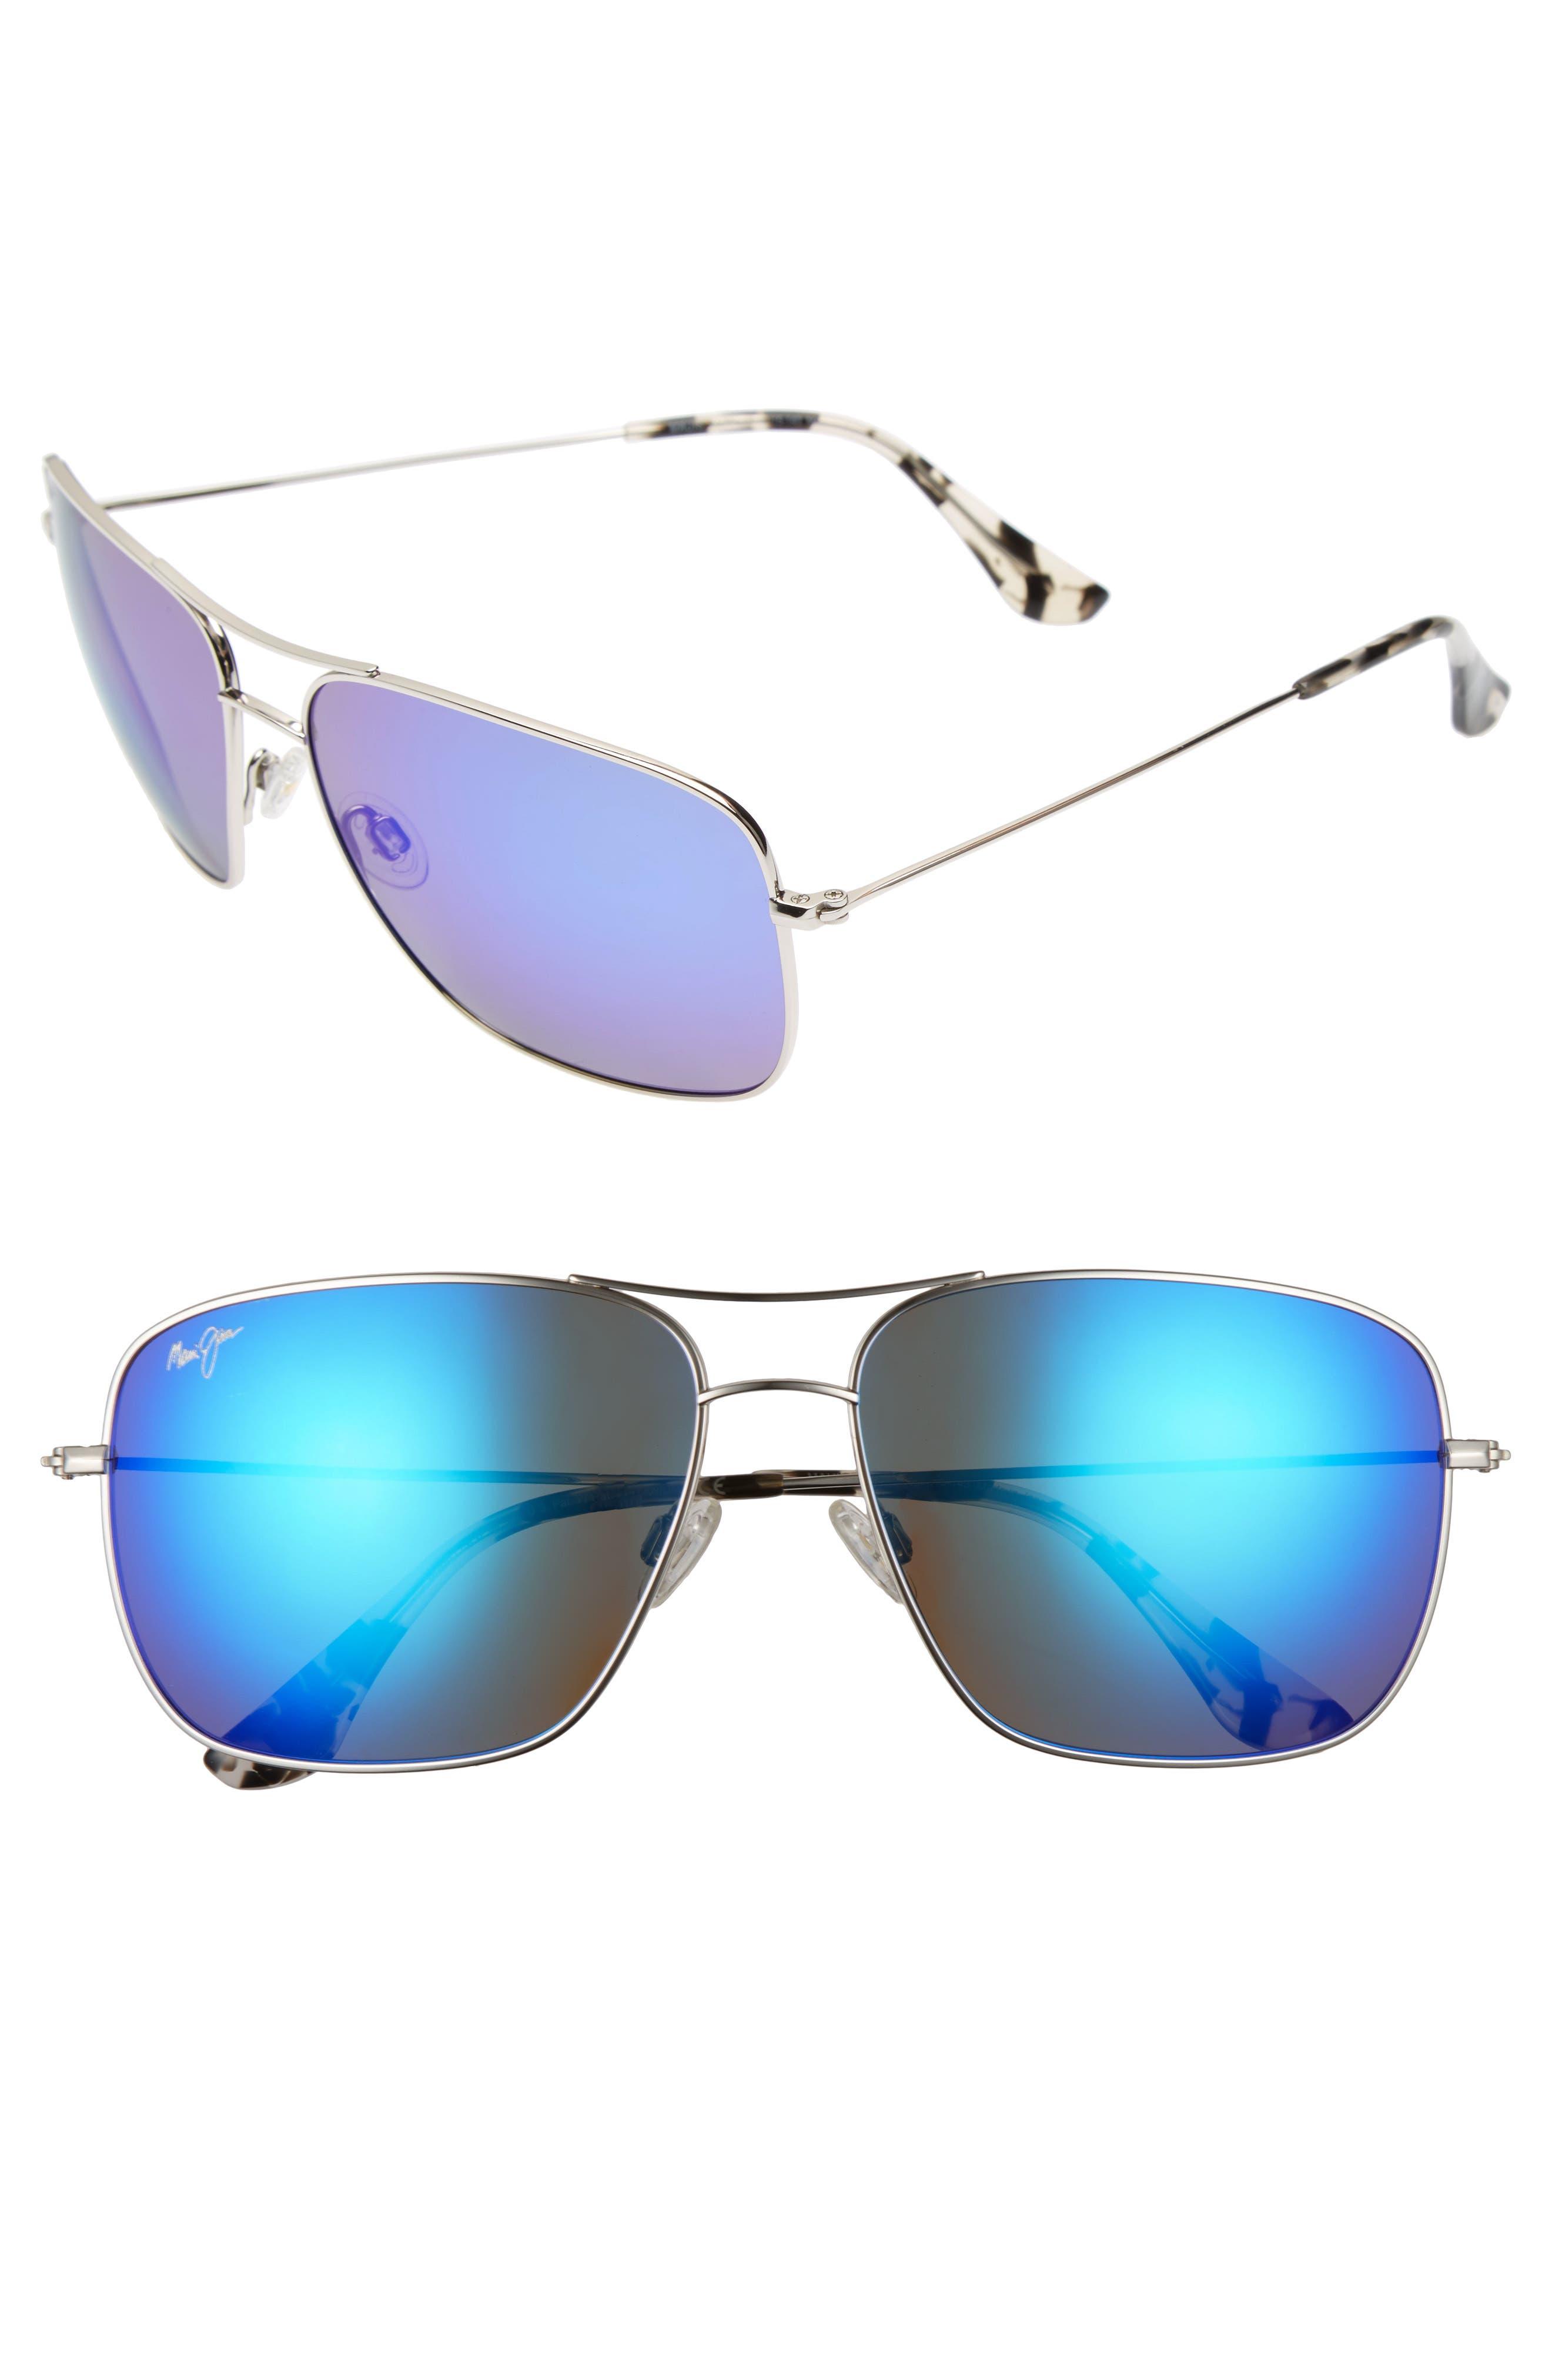 Cook Pines 63mm Polarized Titanium Aviator Sunglasses,                         Main,                         color, Silver/ Blue Hawaii